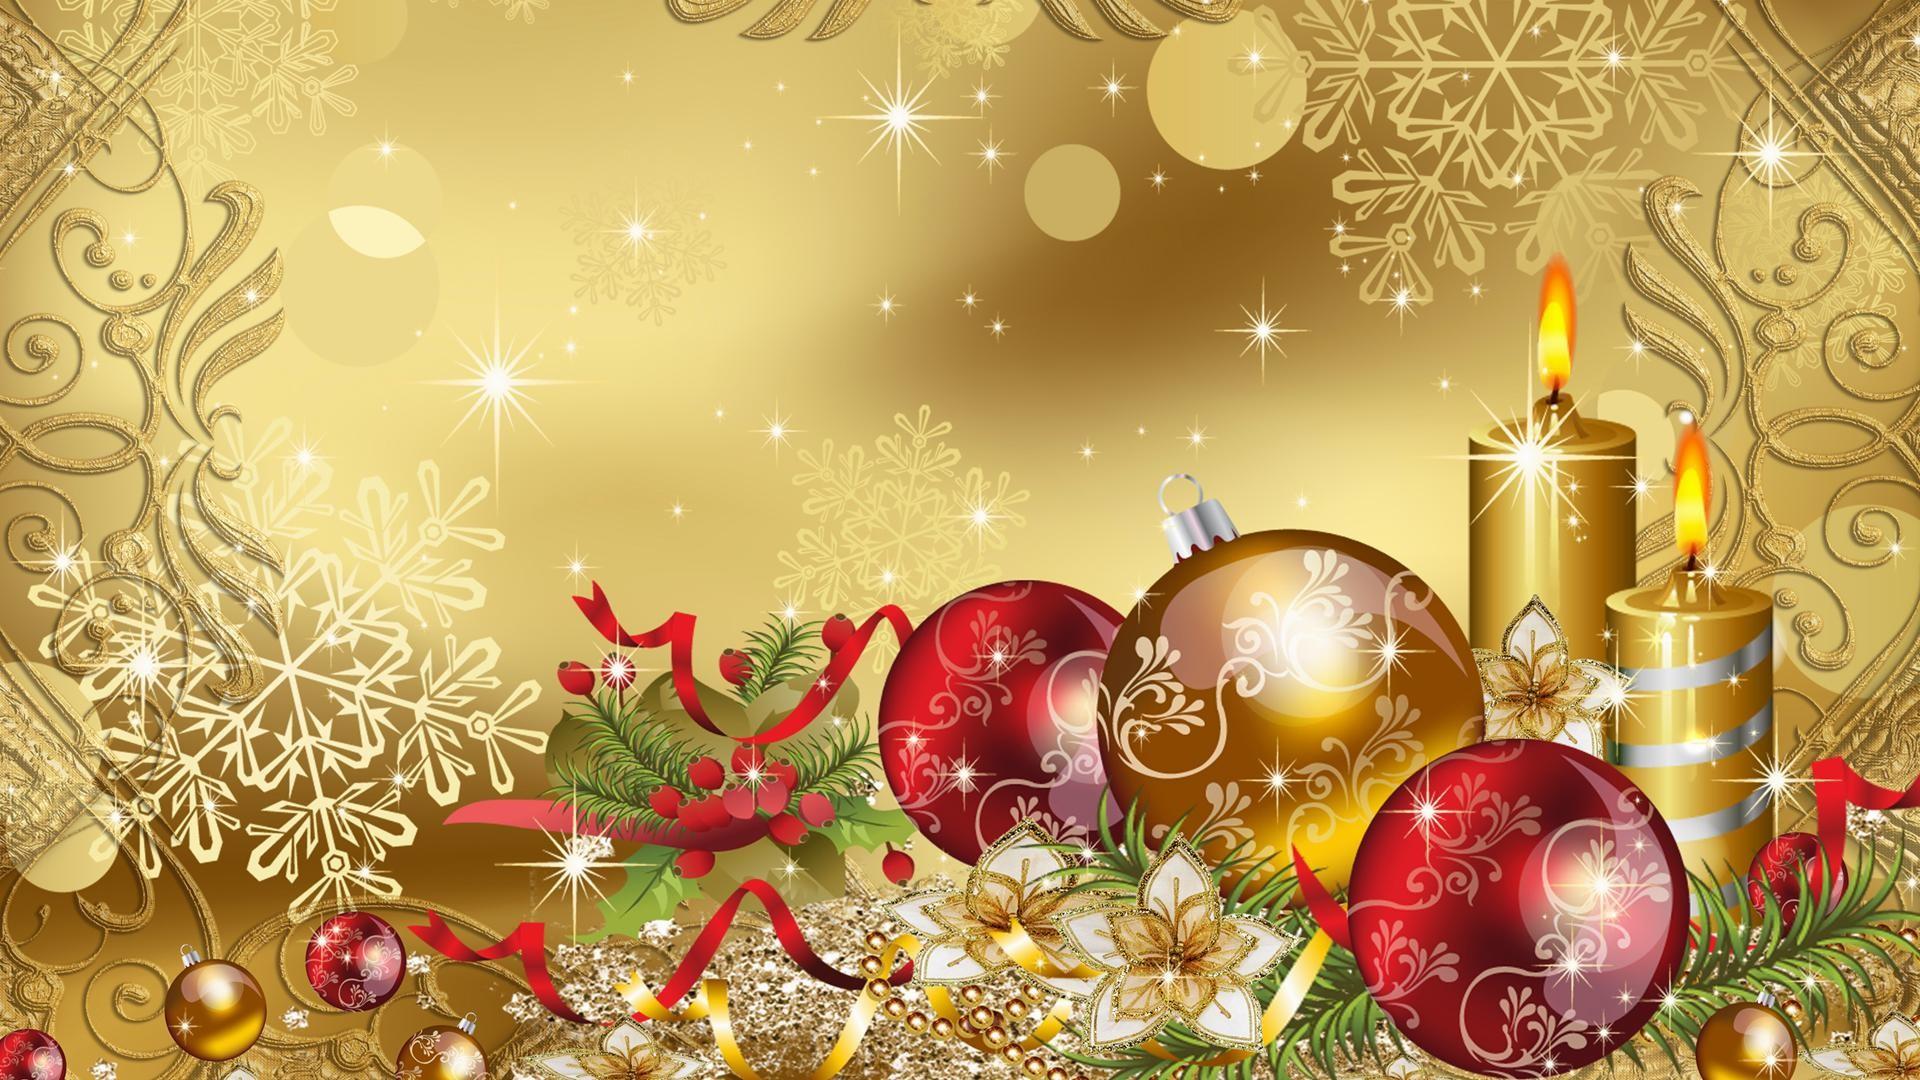 9. hd-christmas-desktop-wallpaper9-600×338